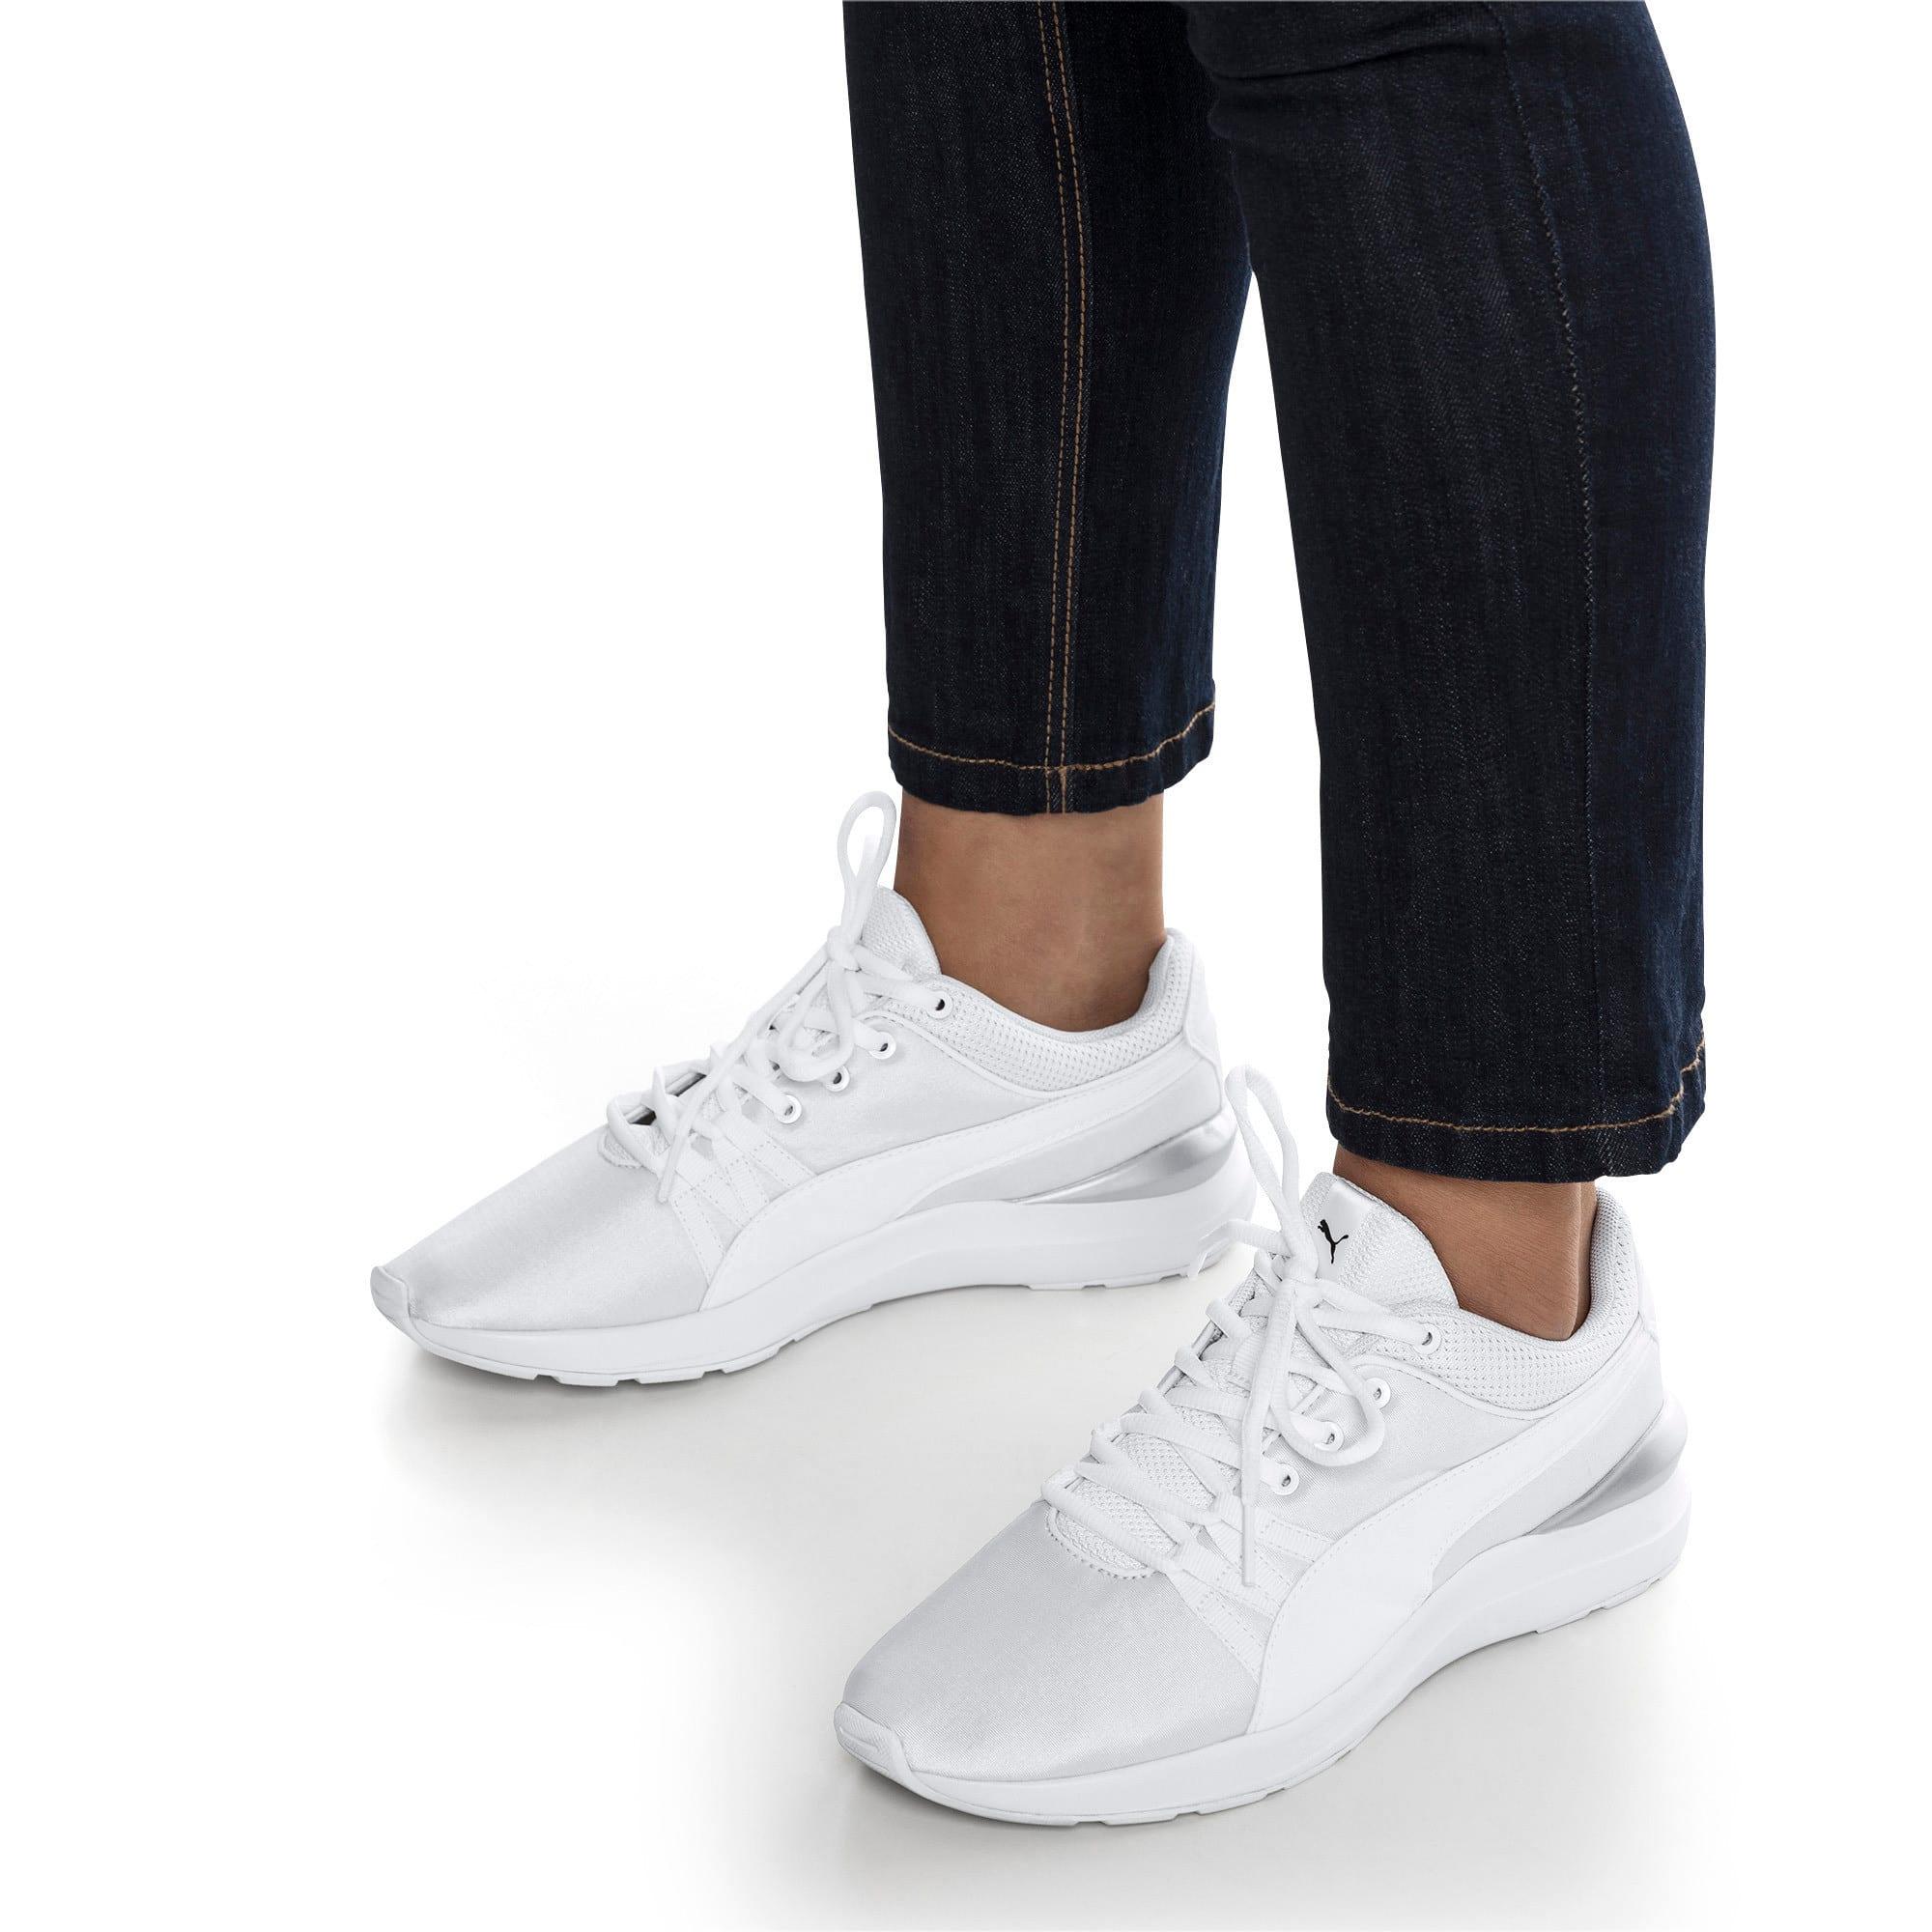 Thumbnail 7 of Adela Women's Sneakers, Puma White-Puma White, medium